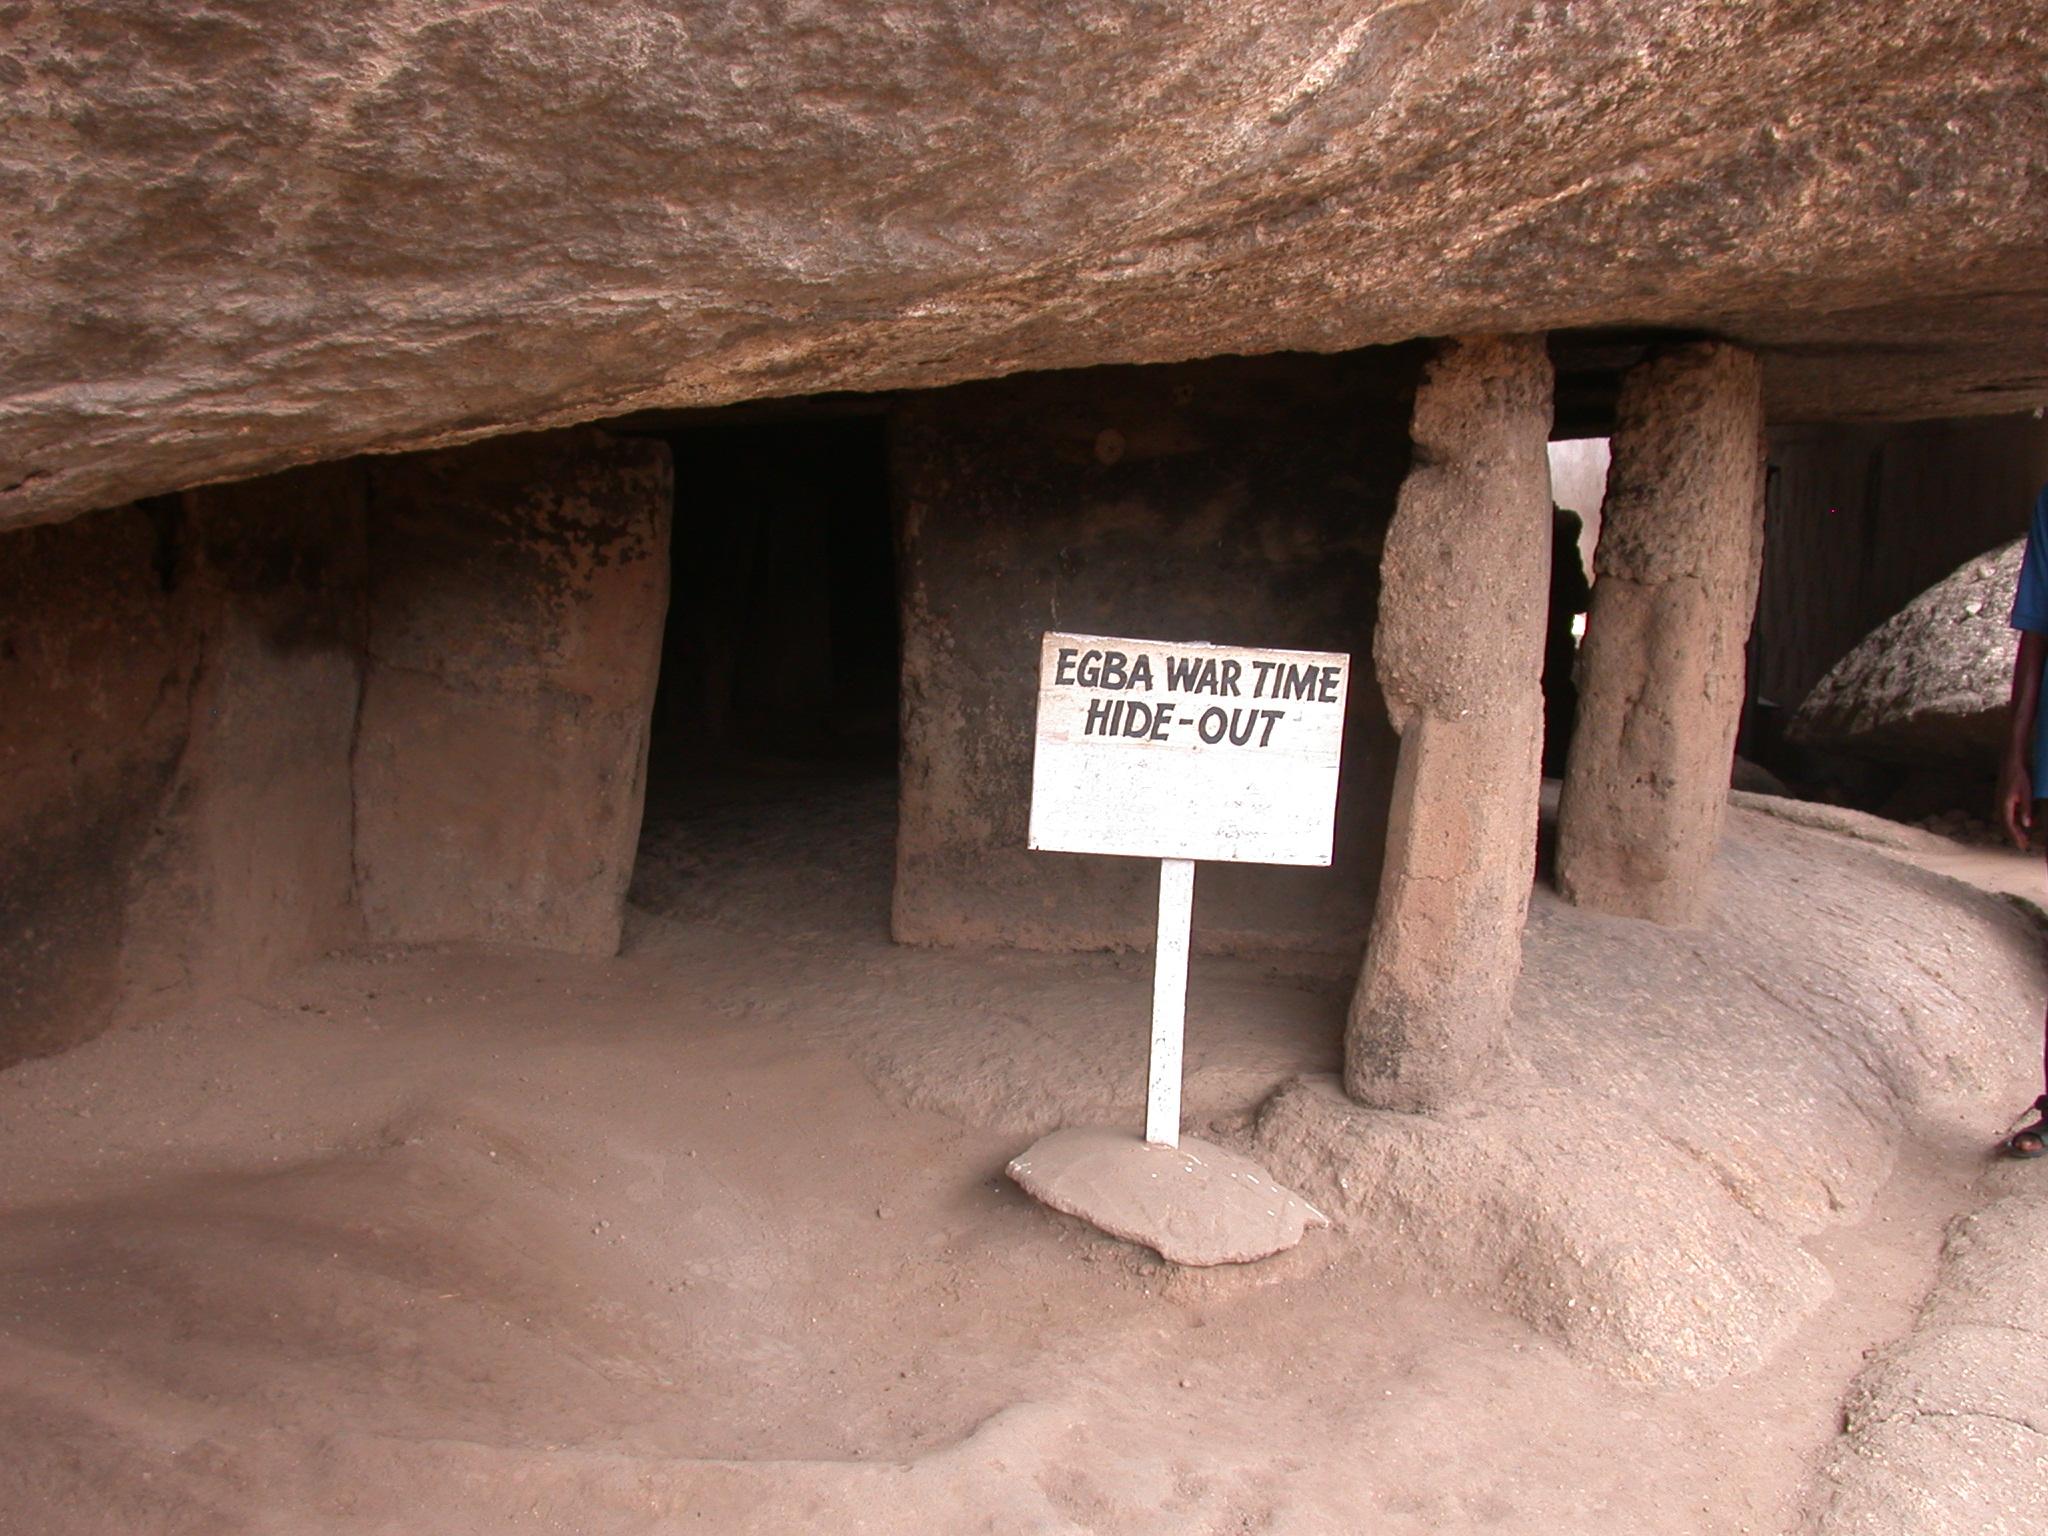 Egba Wartime Hideout, Olumo Rock, Abeokuta, Nigeria